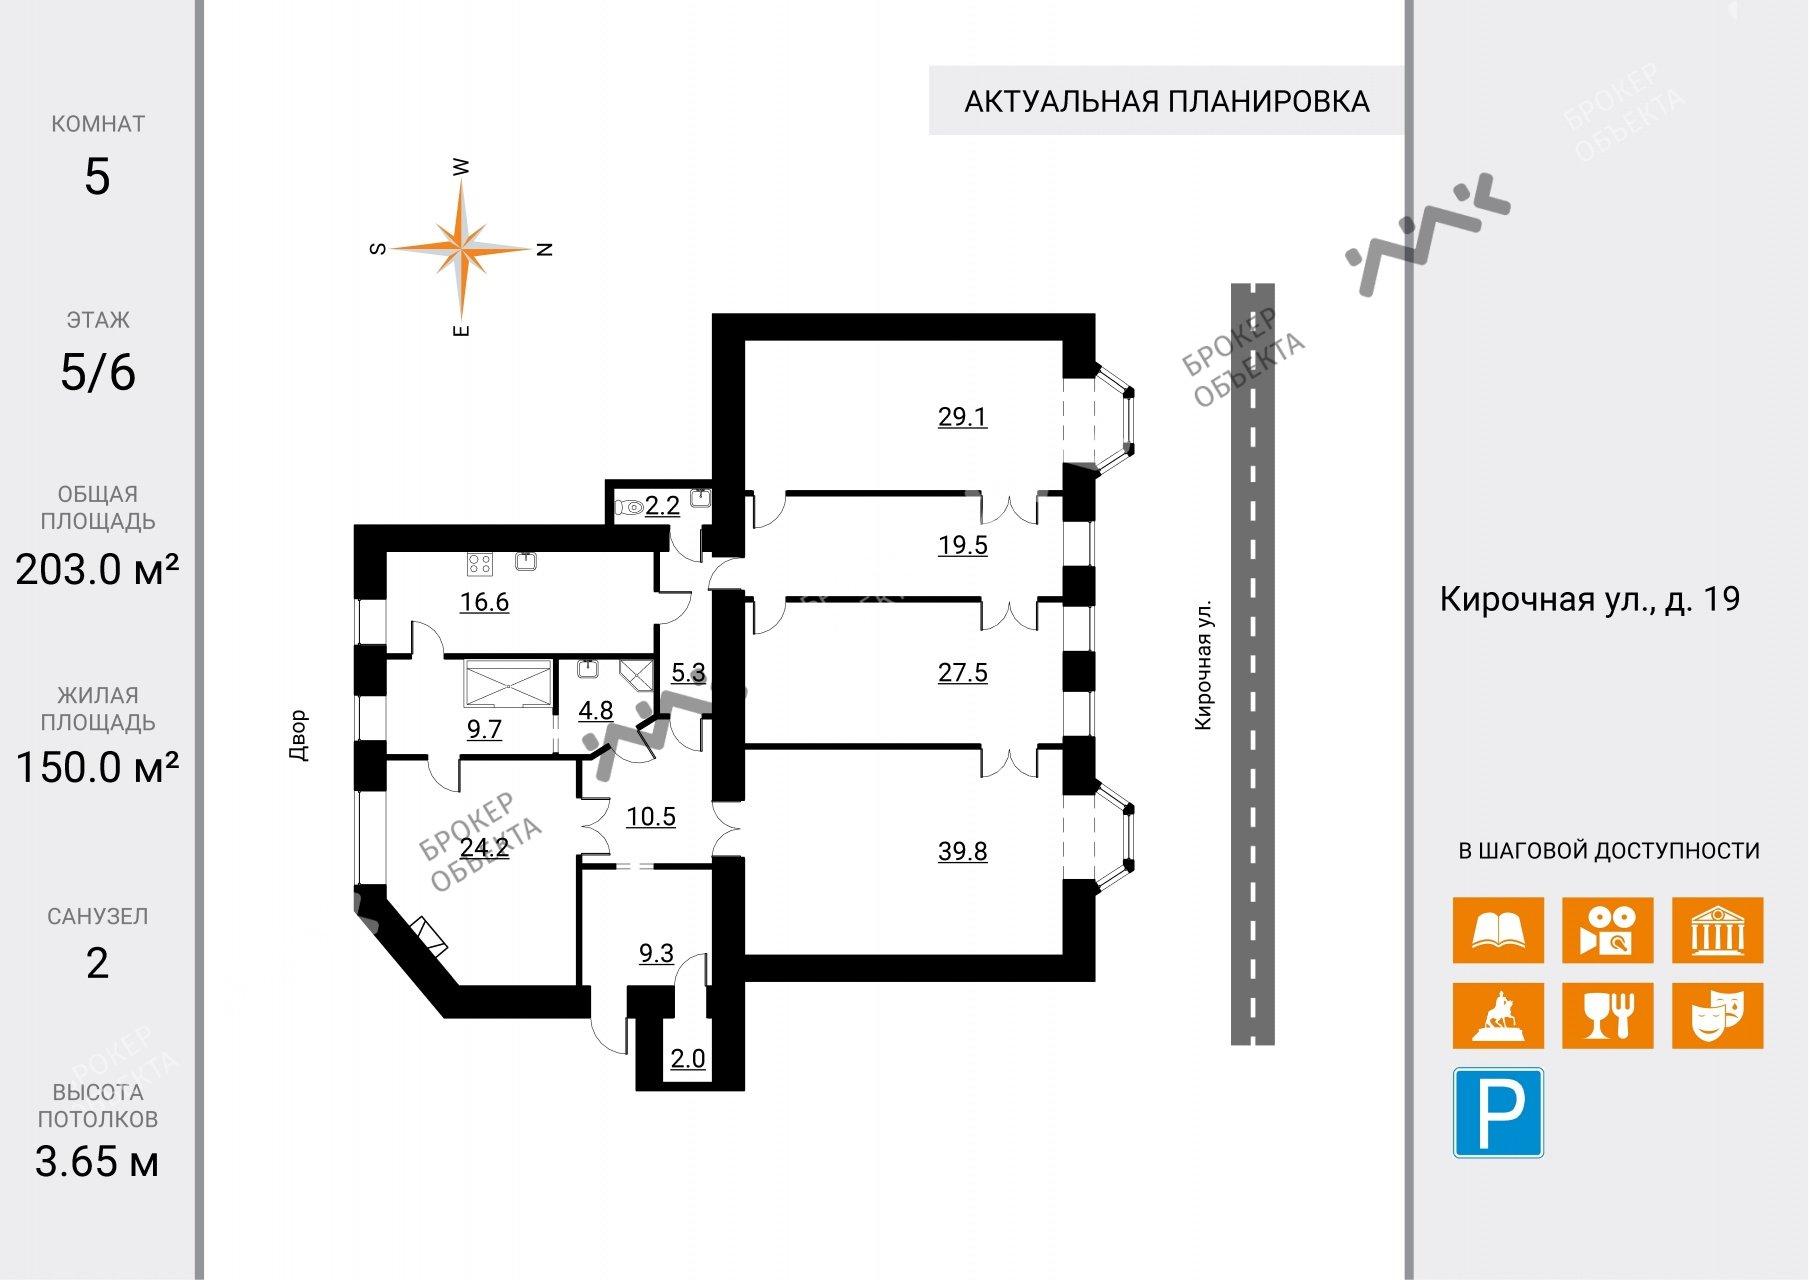 Планировка Кирочная ул., д.19. Лот № 6345864